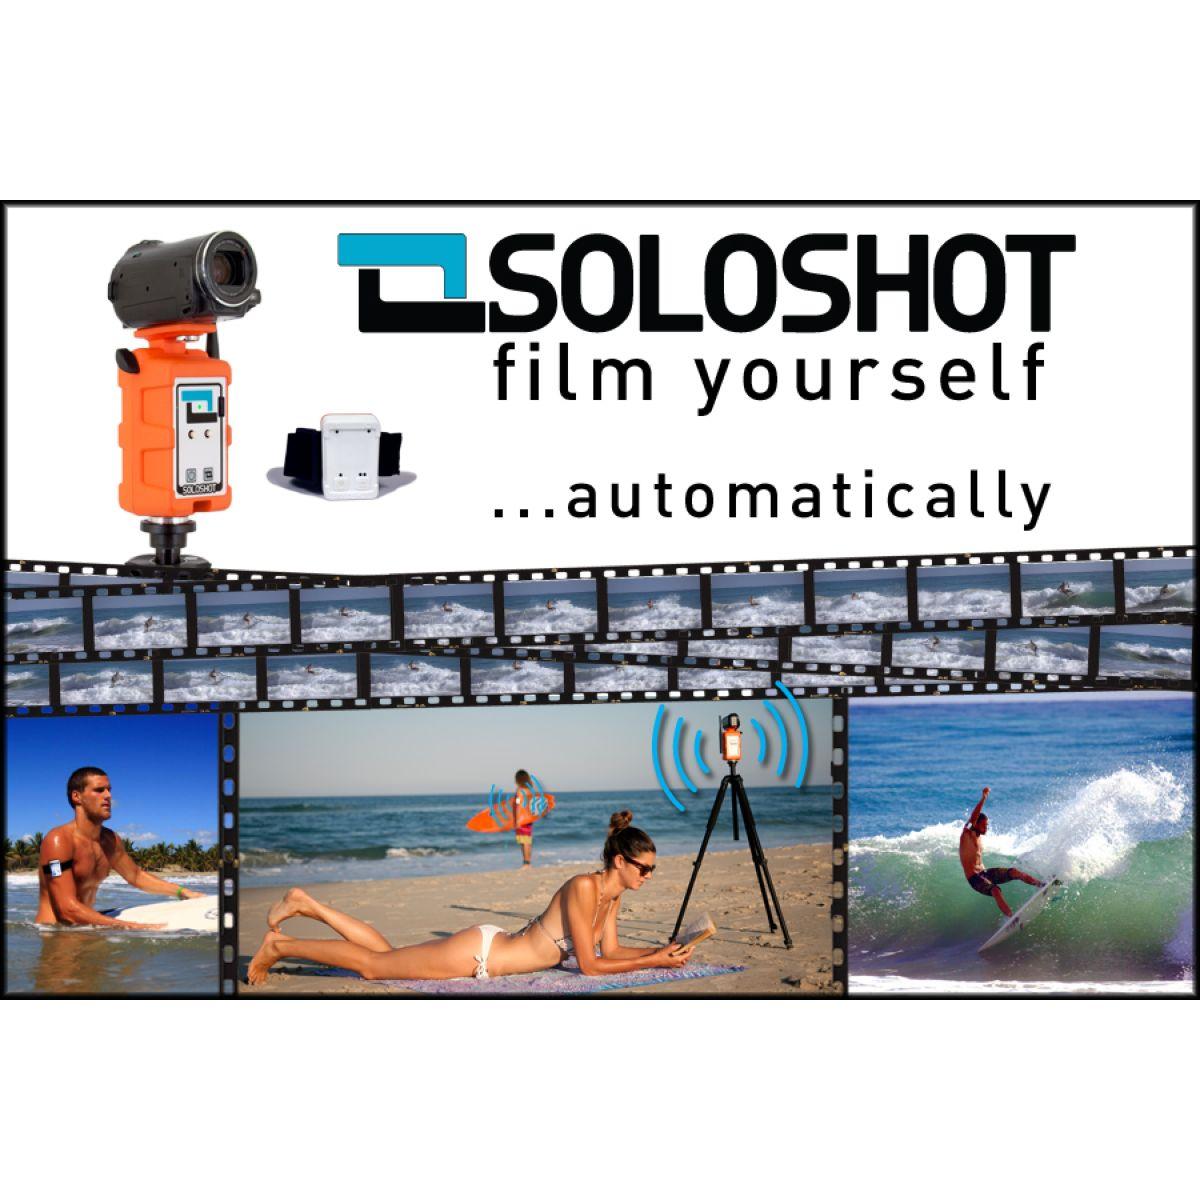 SOLOSHOT2 Camera Controller http://goo.gl/UX8W03 #SoloShot2 #Soloshot #filmyourself #robotcamera #robotcameraman pic.twitter.com/cpaPadXuJ4